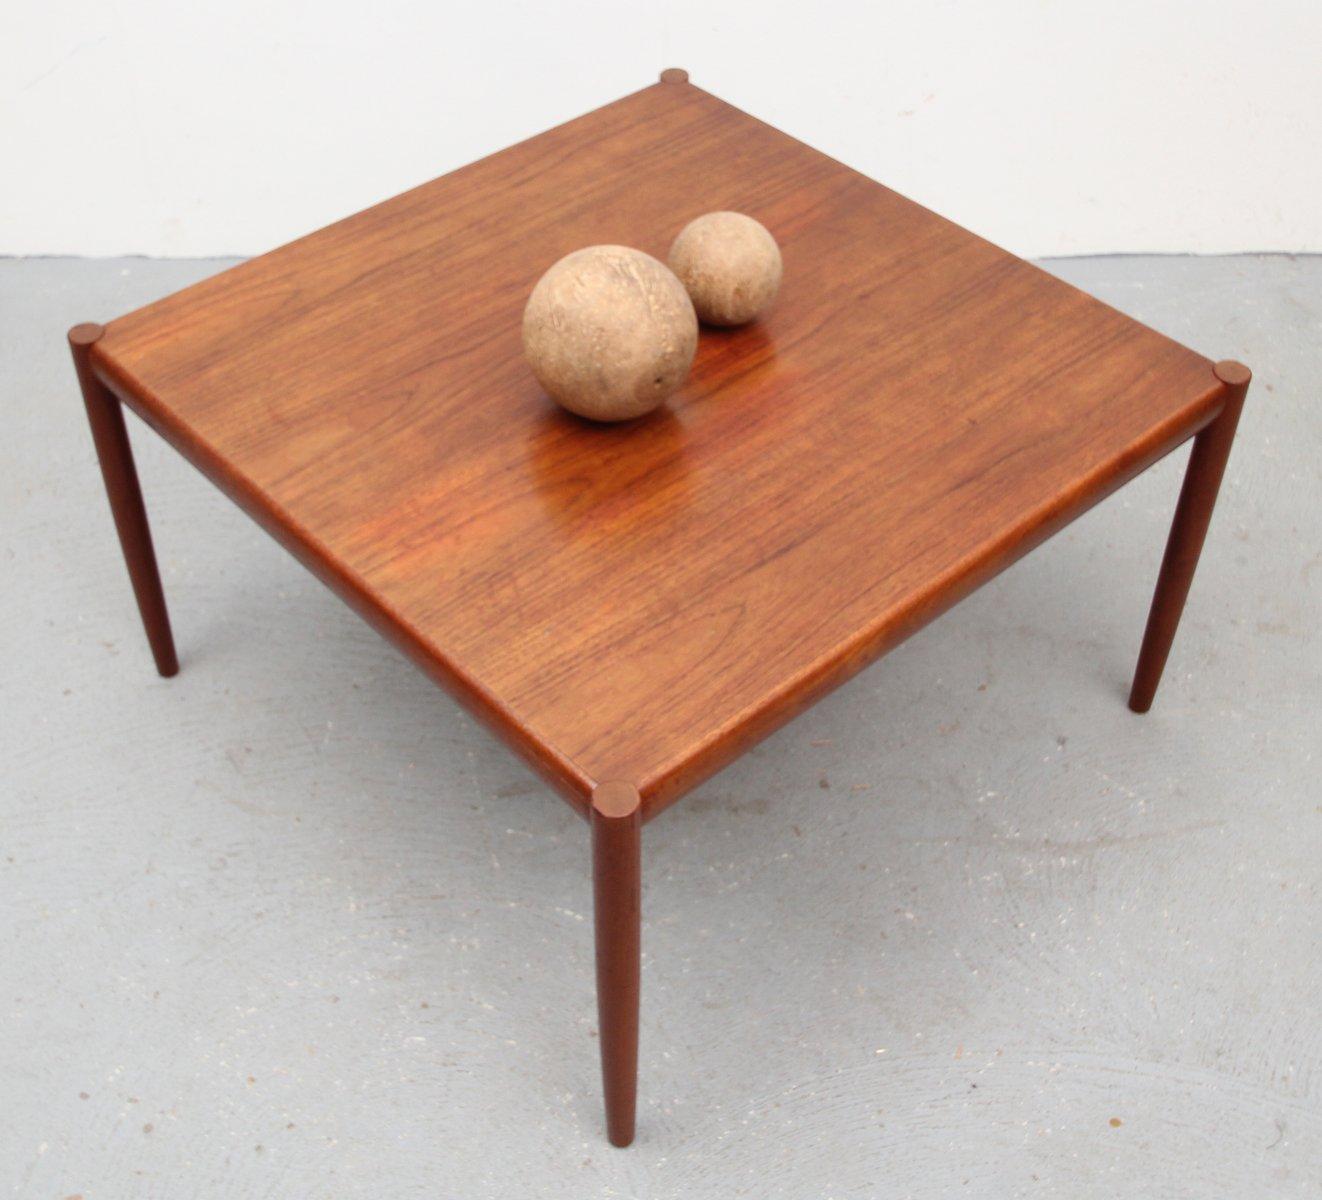 Teak Root Coffee Table Canada: Square Danish Teak Veneer Coffee Table, 1960s For Sale At